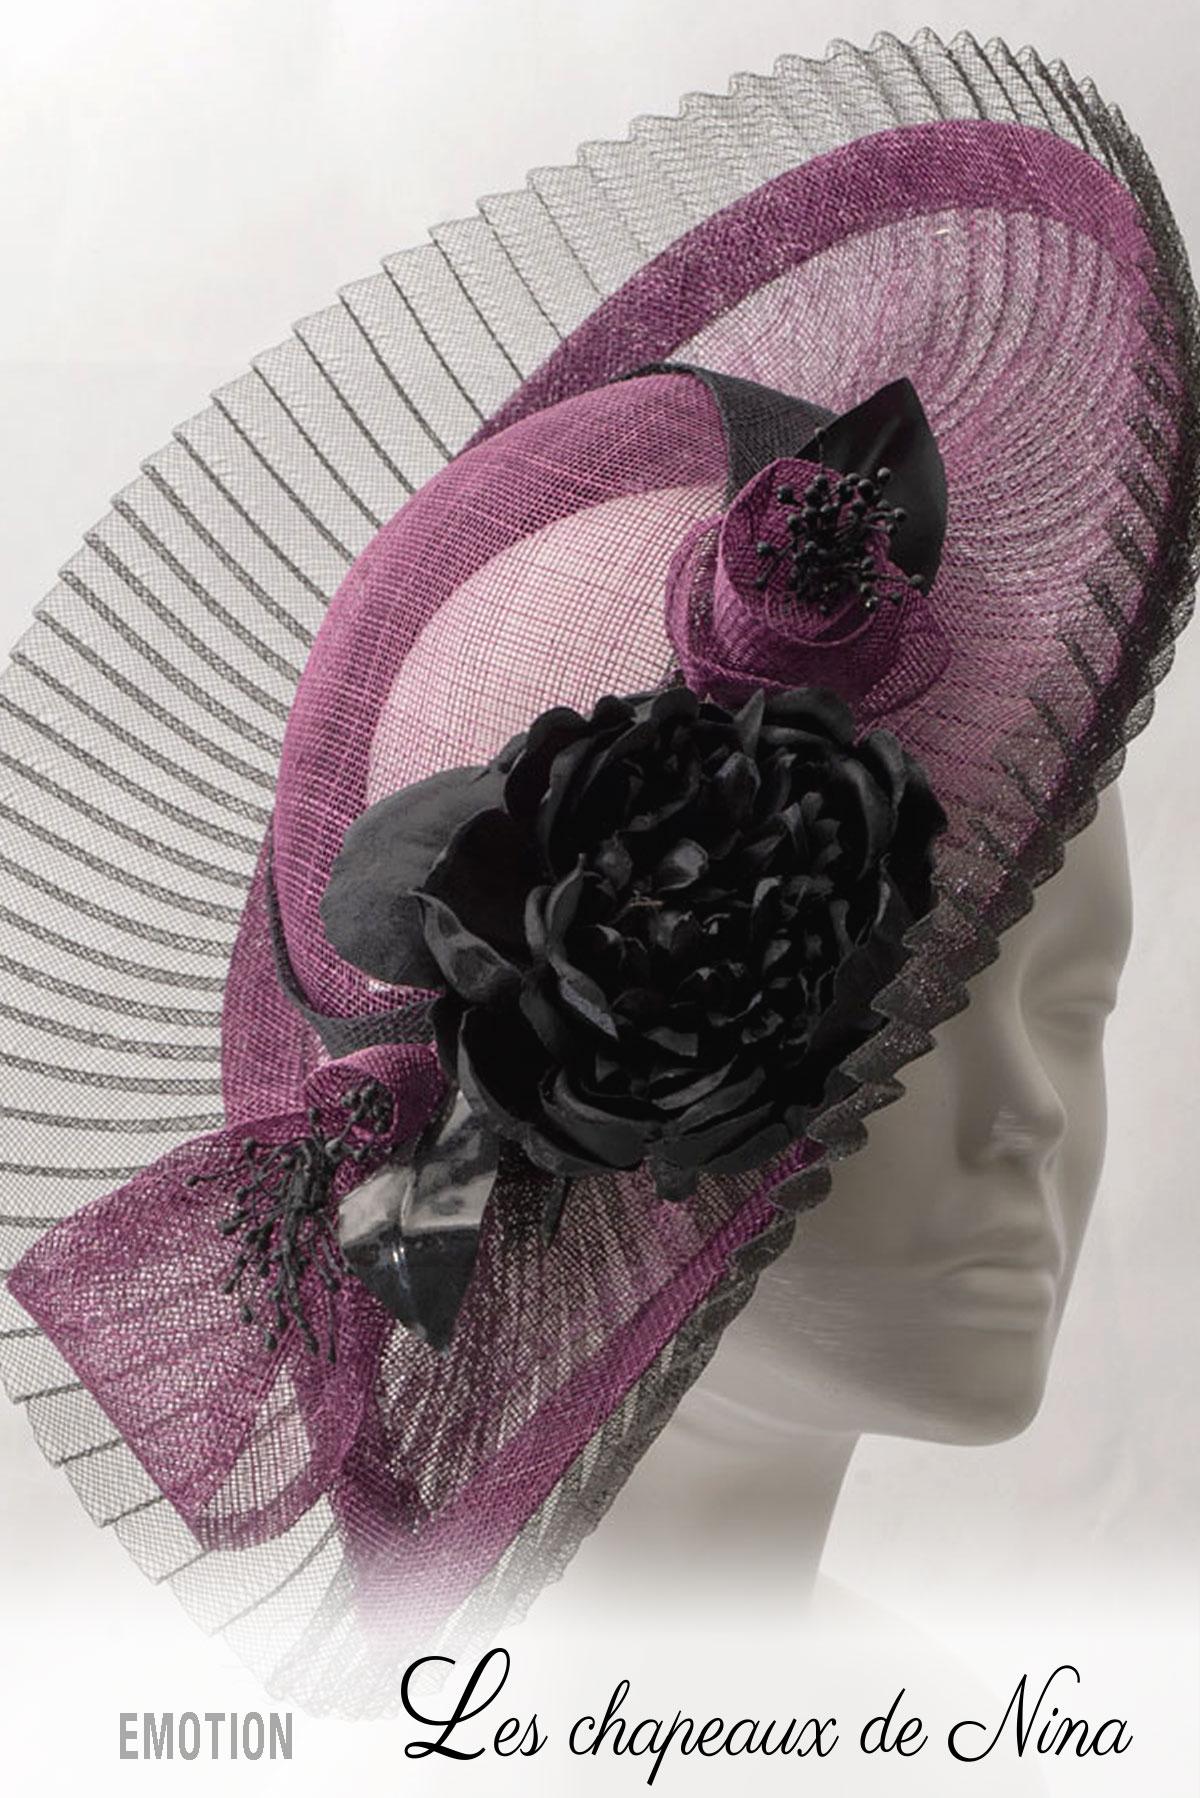 Knit cap - Headpiece